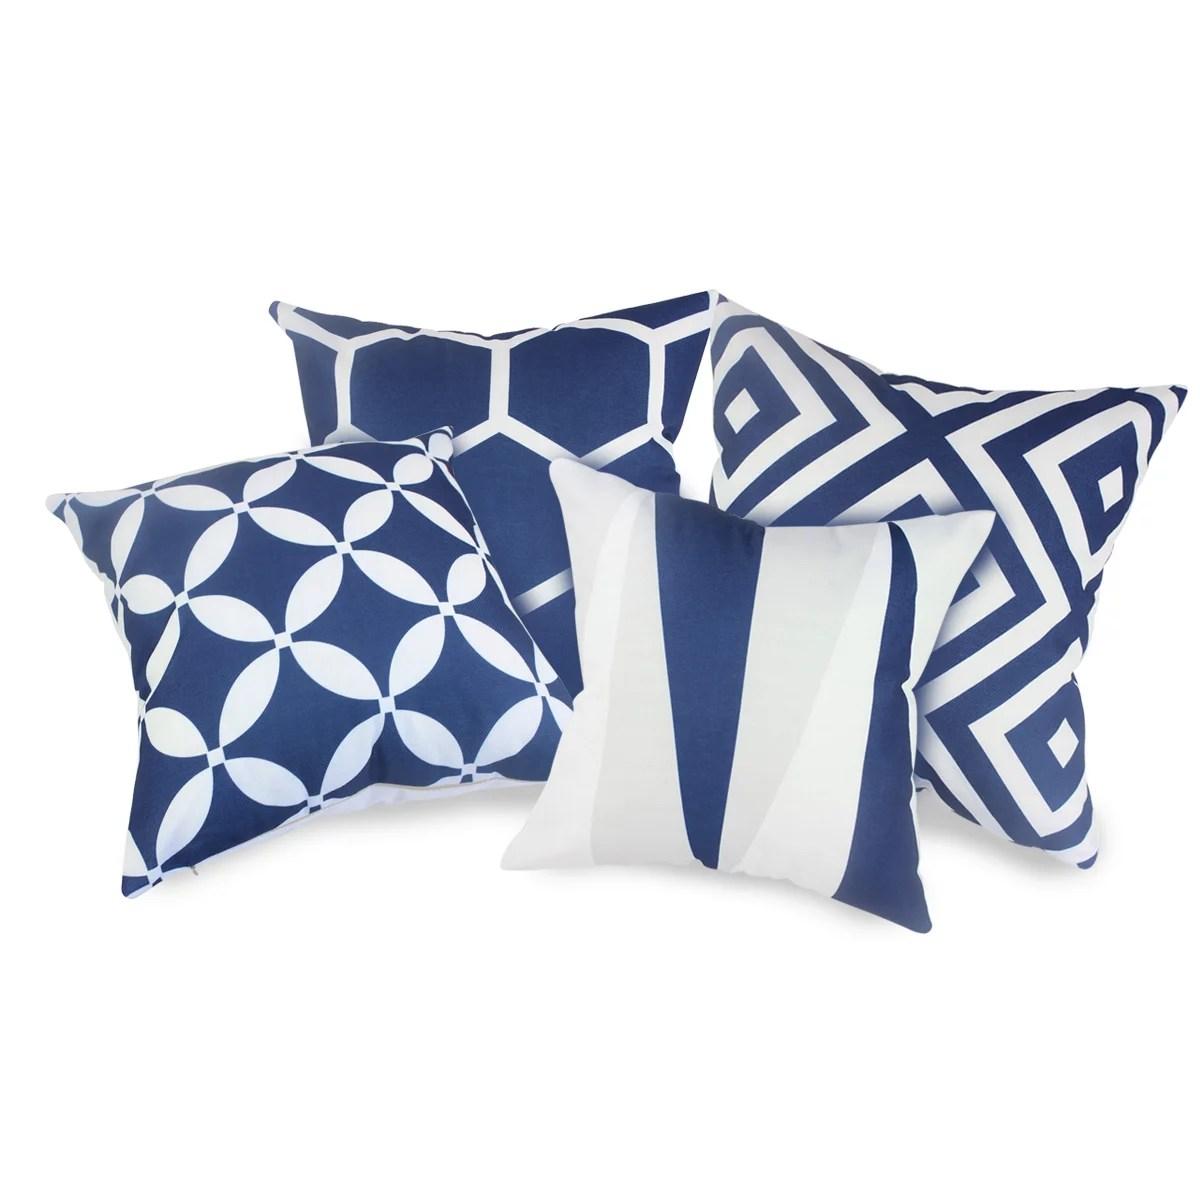 tayyakoushi 4 packs navy blue throw pillows home decor design pillow covers for living room square cushion covers 18 inch throw pillow case for home